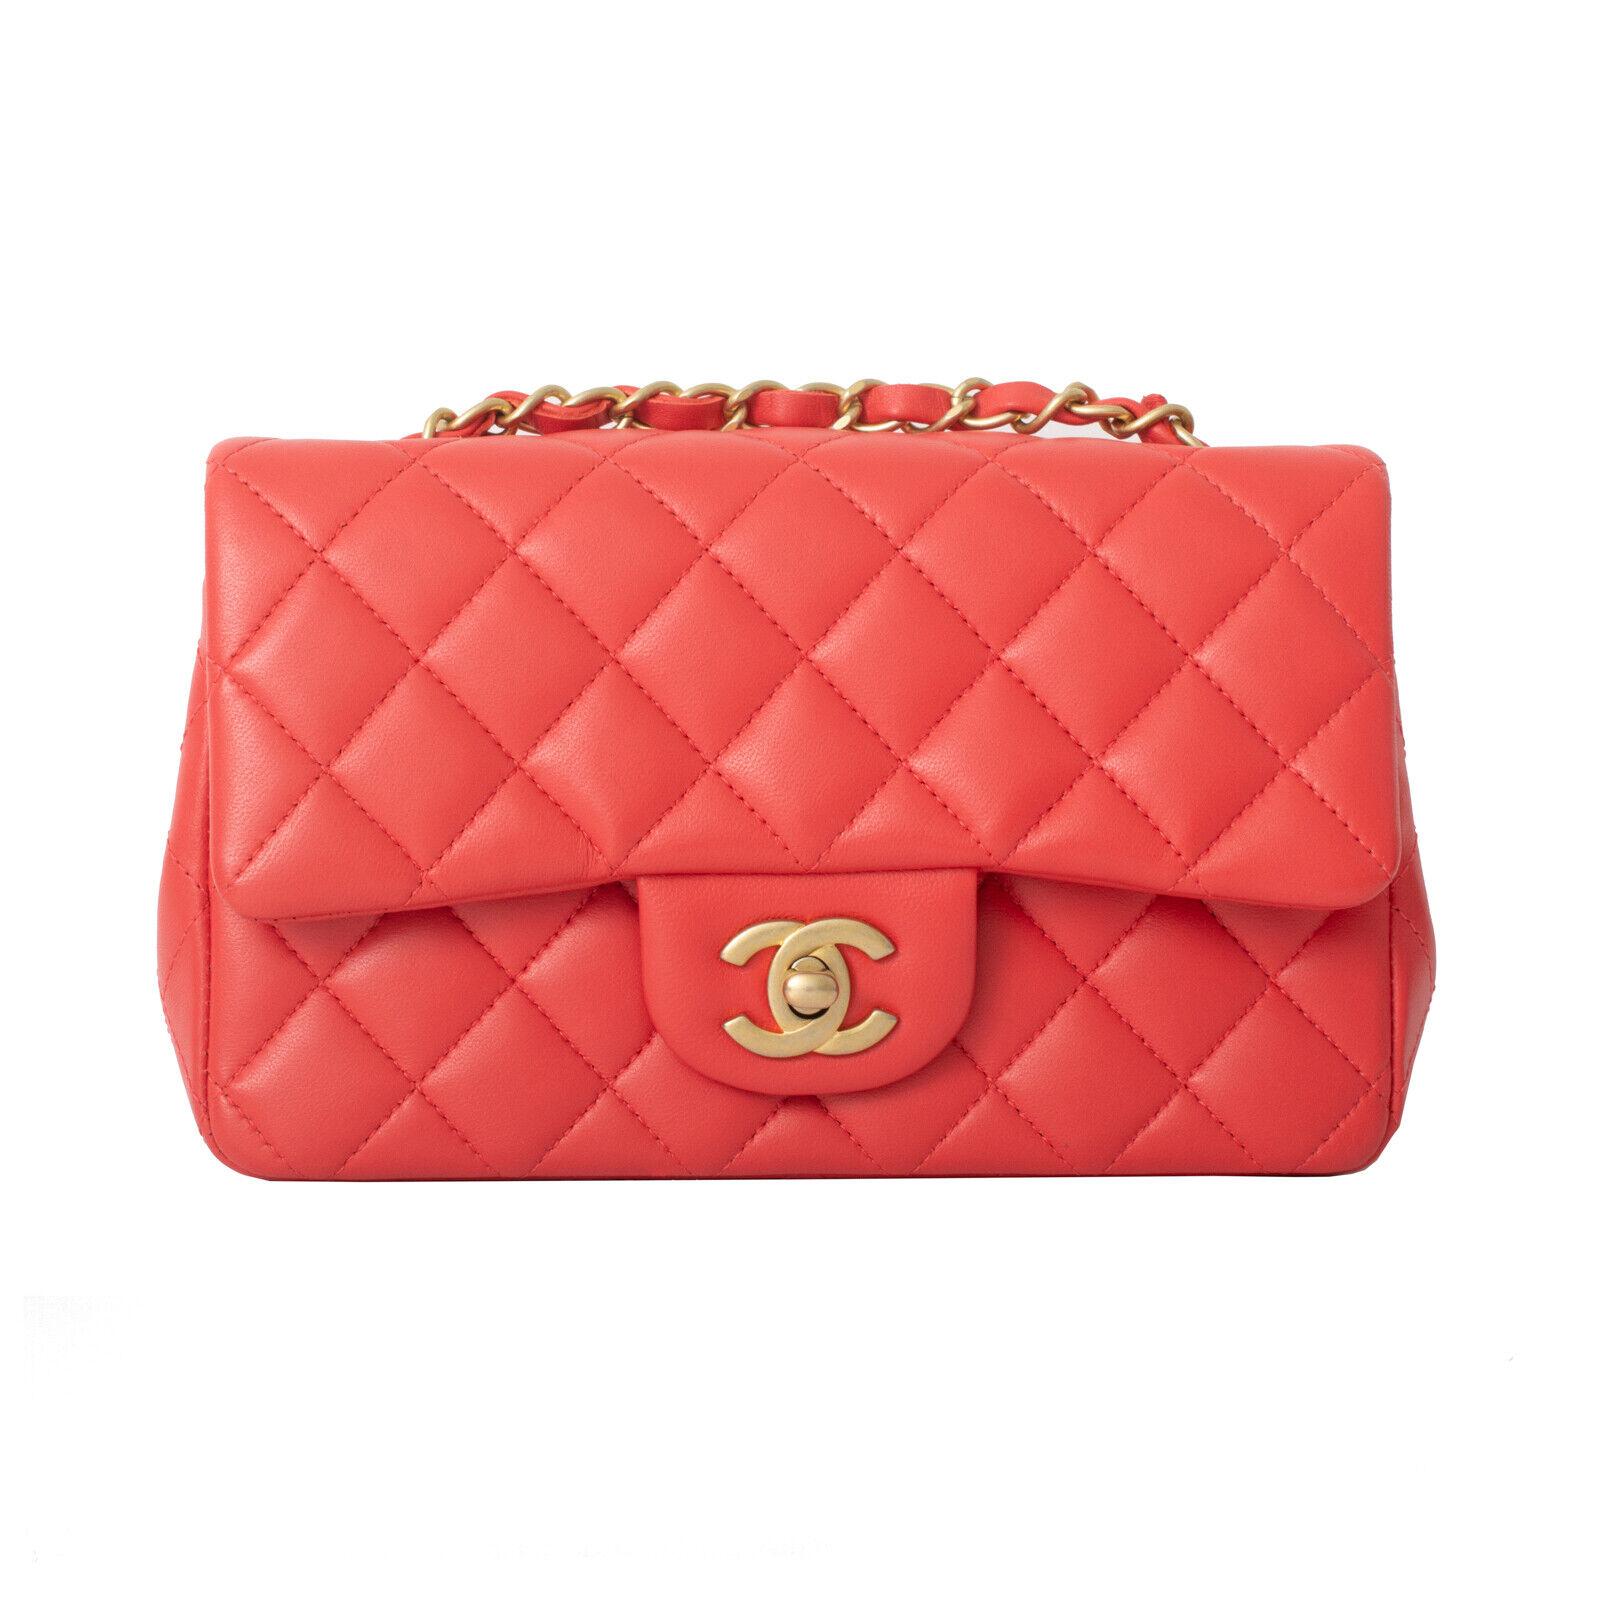 CHANEL Rouge Agneau Lambskin Mini Flap Bag Gold Tone Hardware